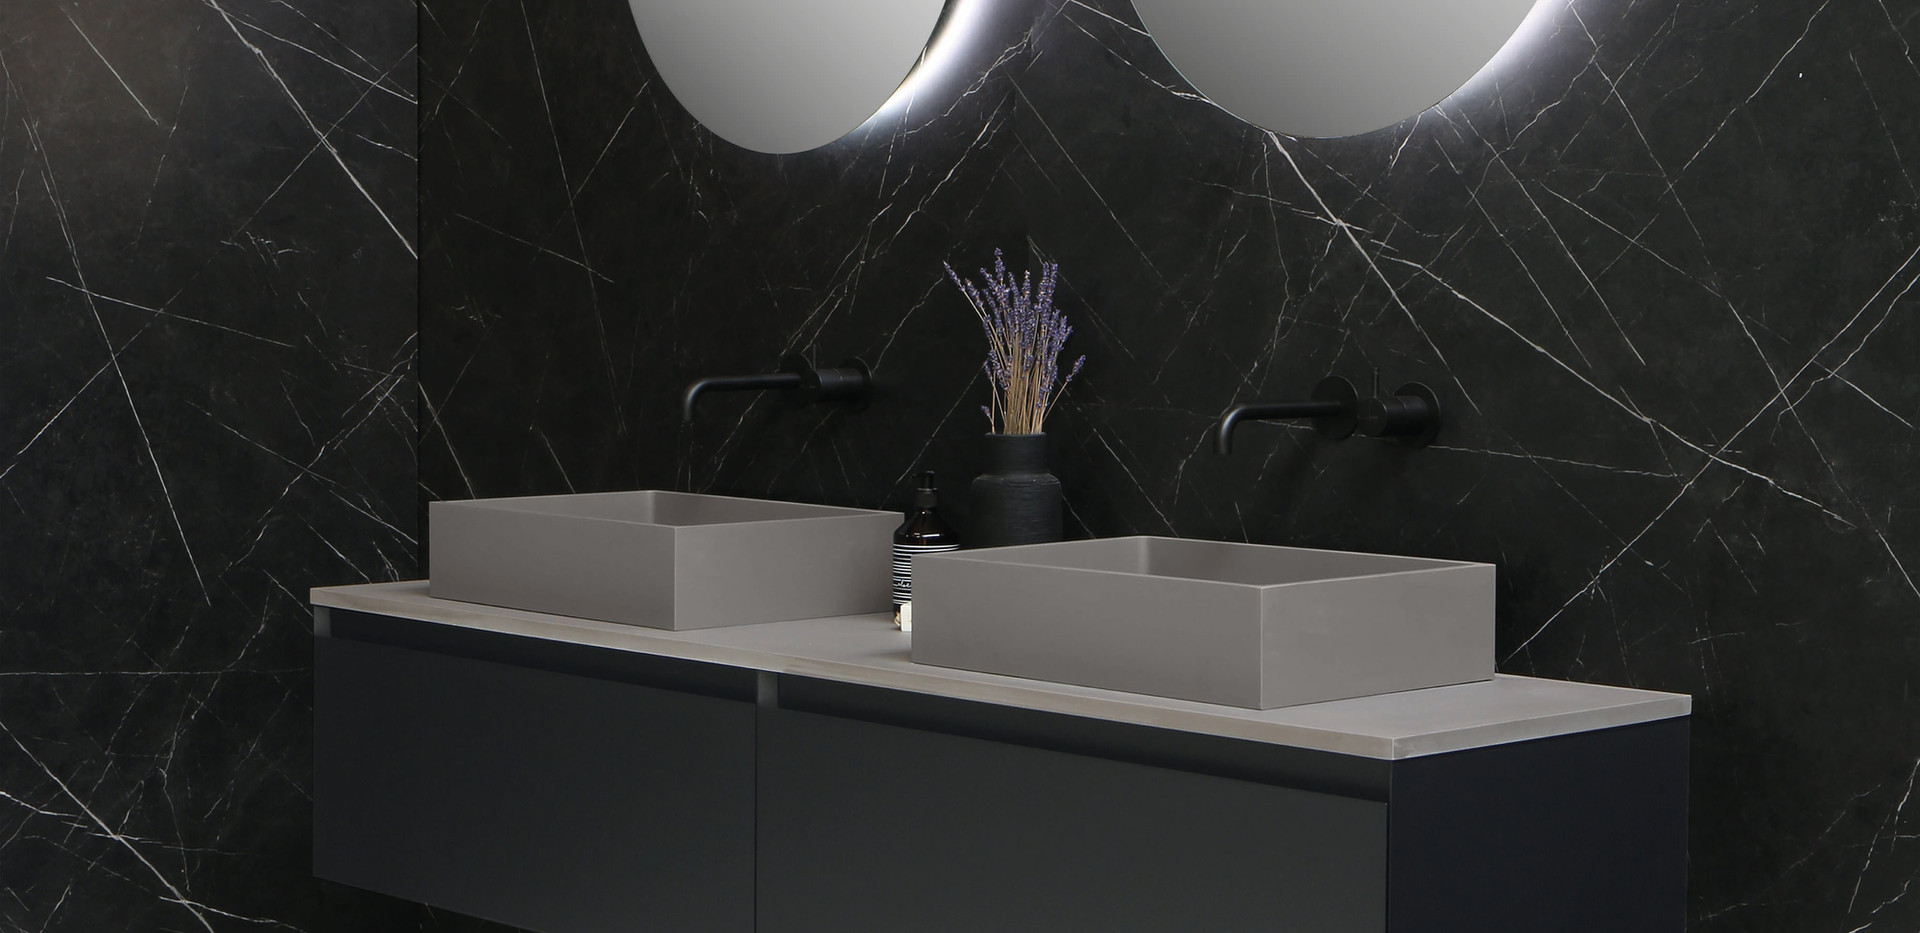 Bliss dogma quartz beton - onderkast mat zwart